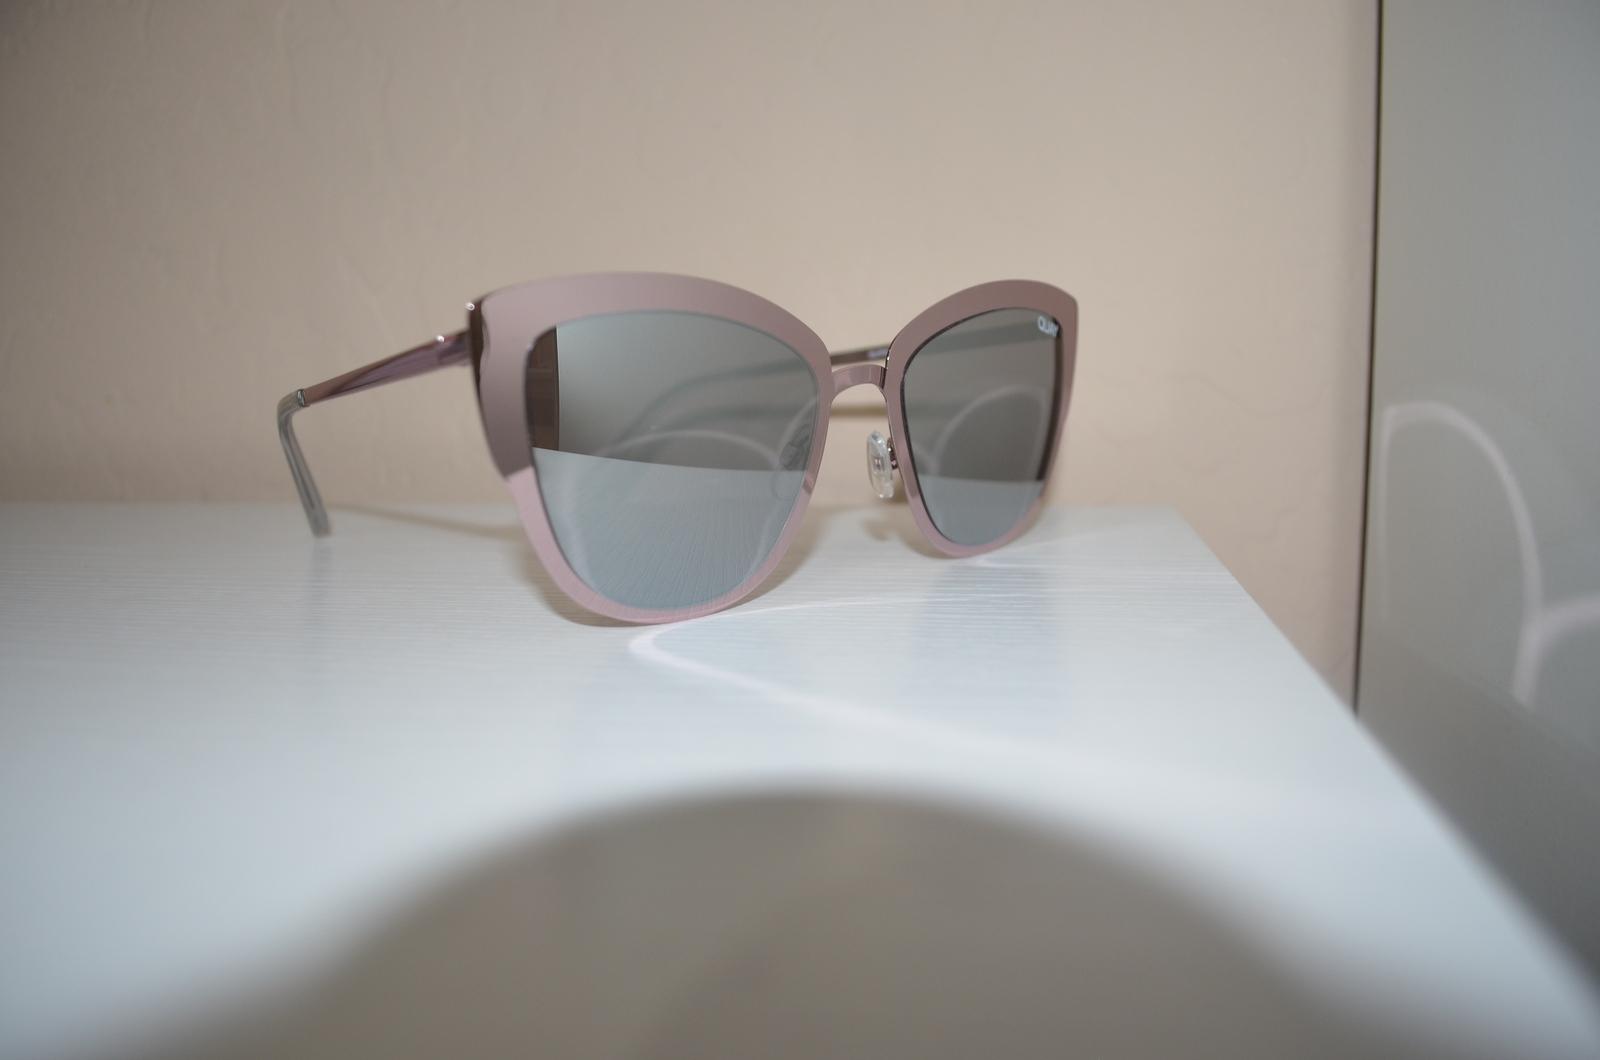 3d1abc1c1d Quay Supergirl Pink Silver Reflective Mirror Cat-Eye Sunglasses BNWT